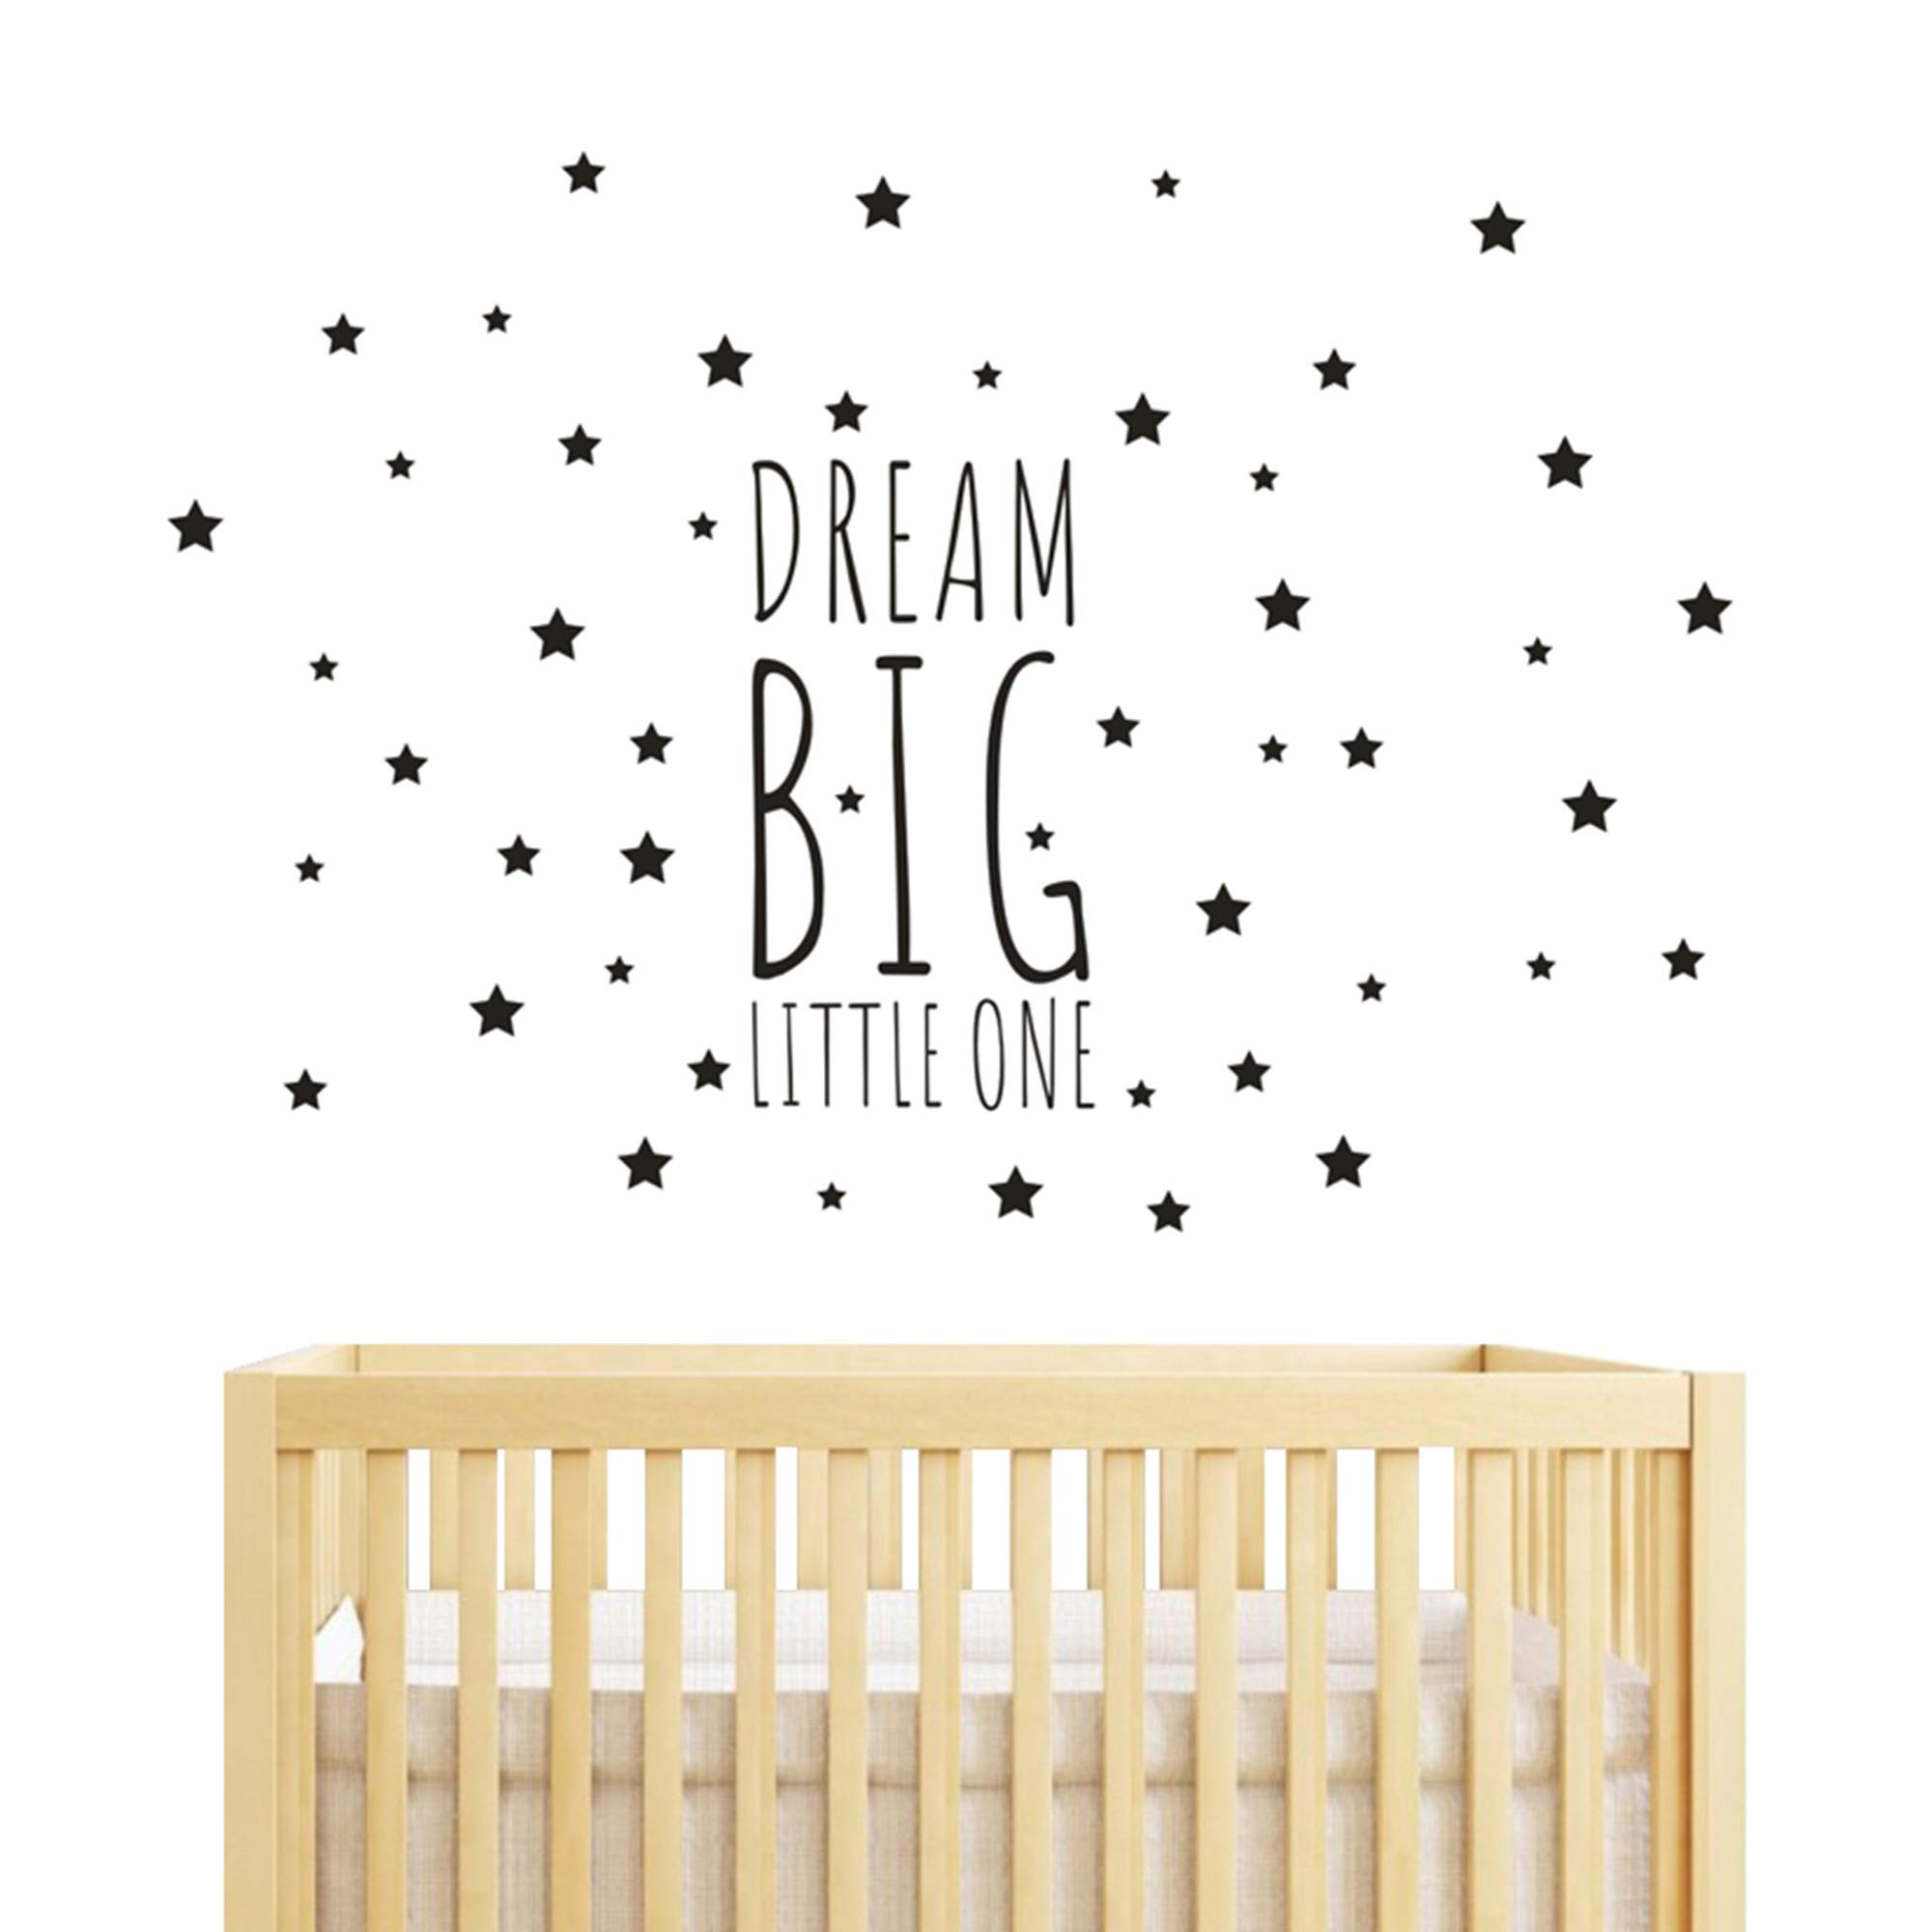 JOYRESIDE Dream Big Little One Night Sleep Wall Decal Vinyl Sticker Stars Decor Nursery Kids Babys Room Home Bedroom Quote Decoration YMX14 (Black, Big)